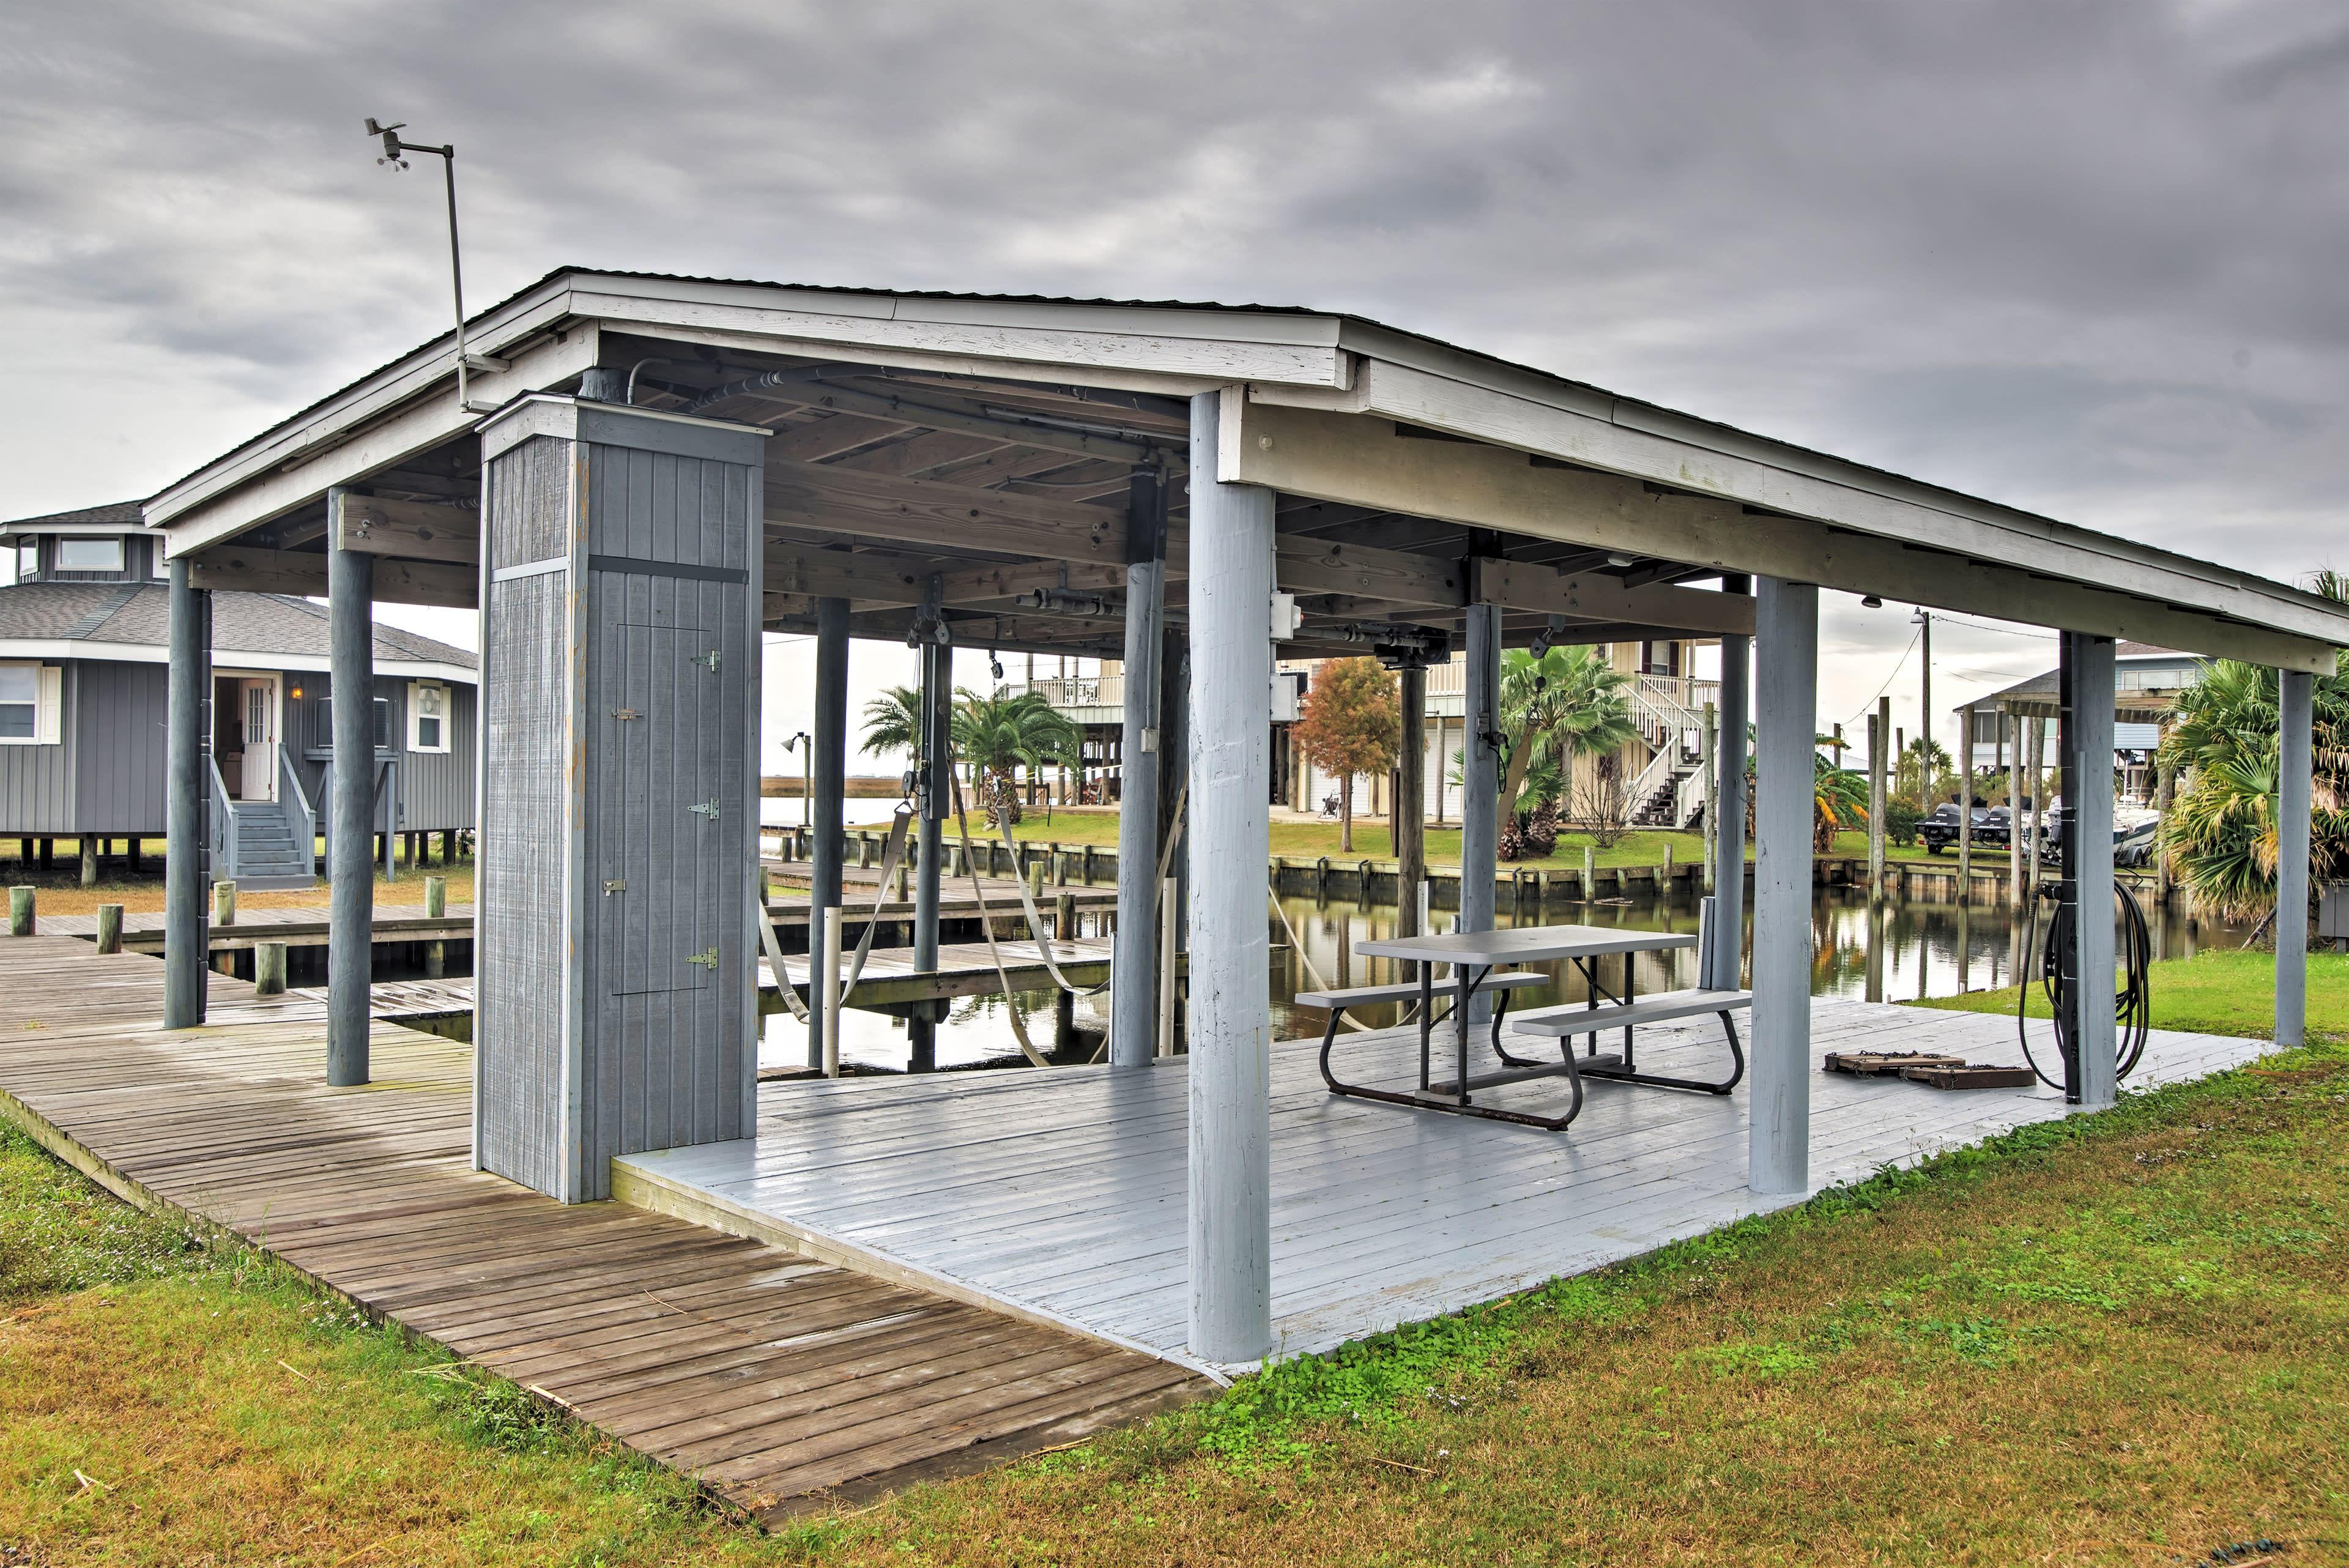 Shared Boat Dock